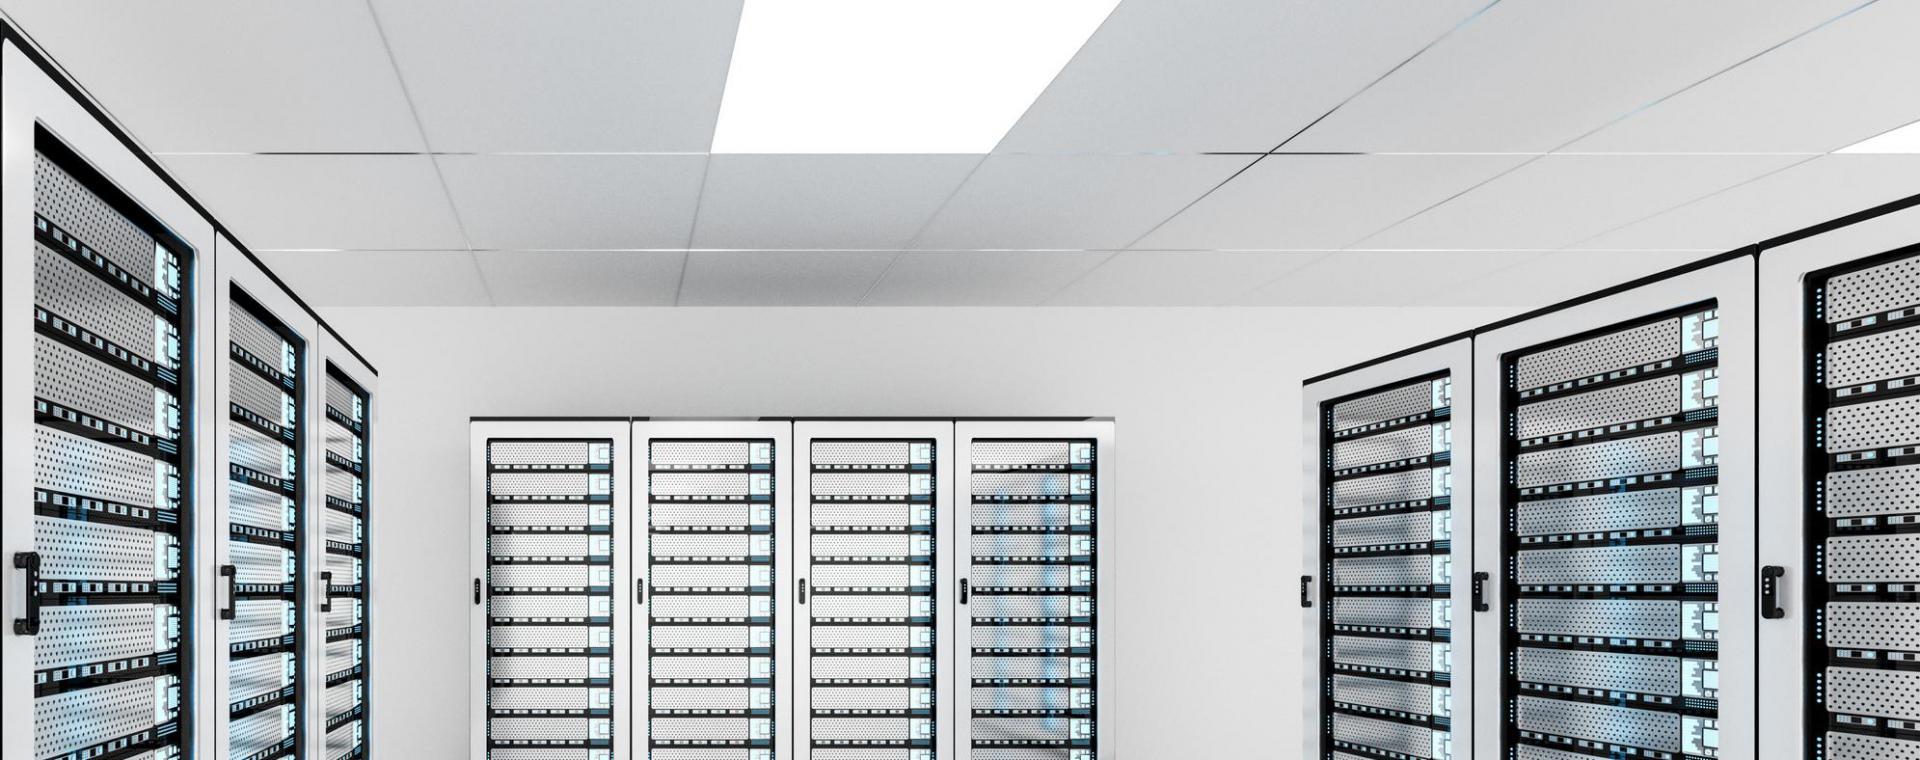 Hell beleuchteter Serverraum mit Racks